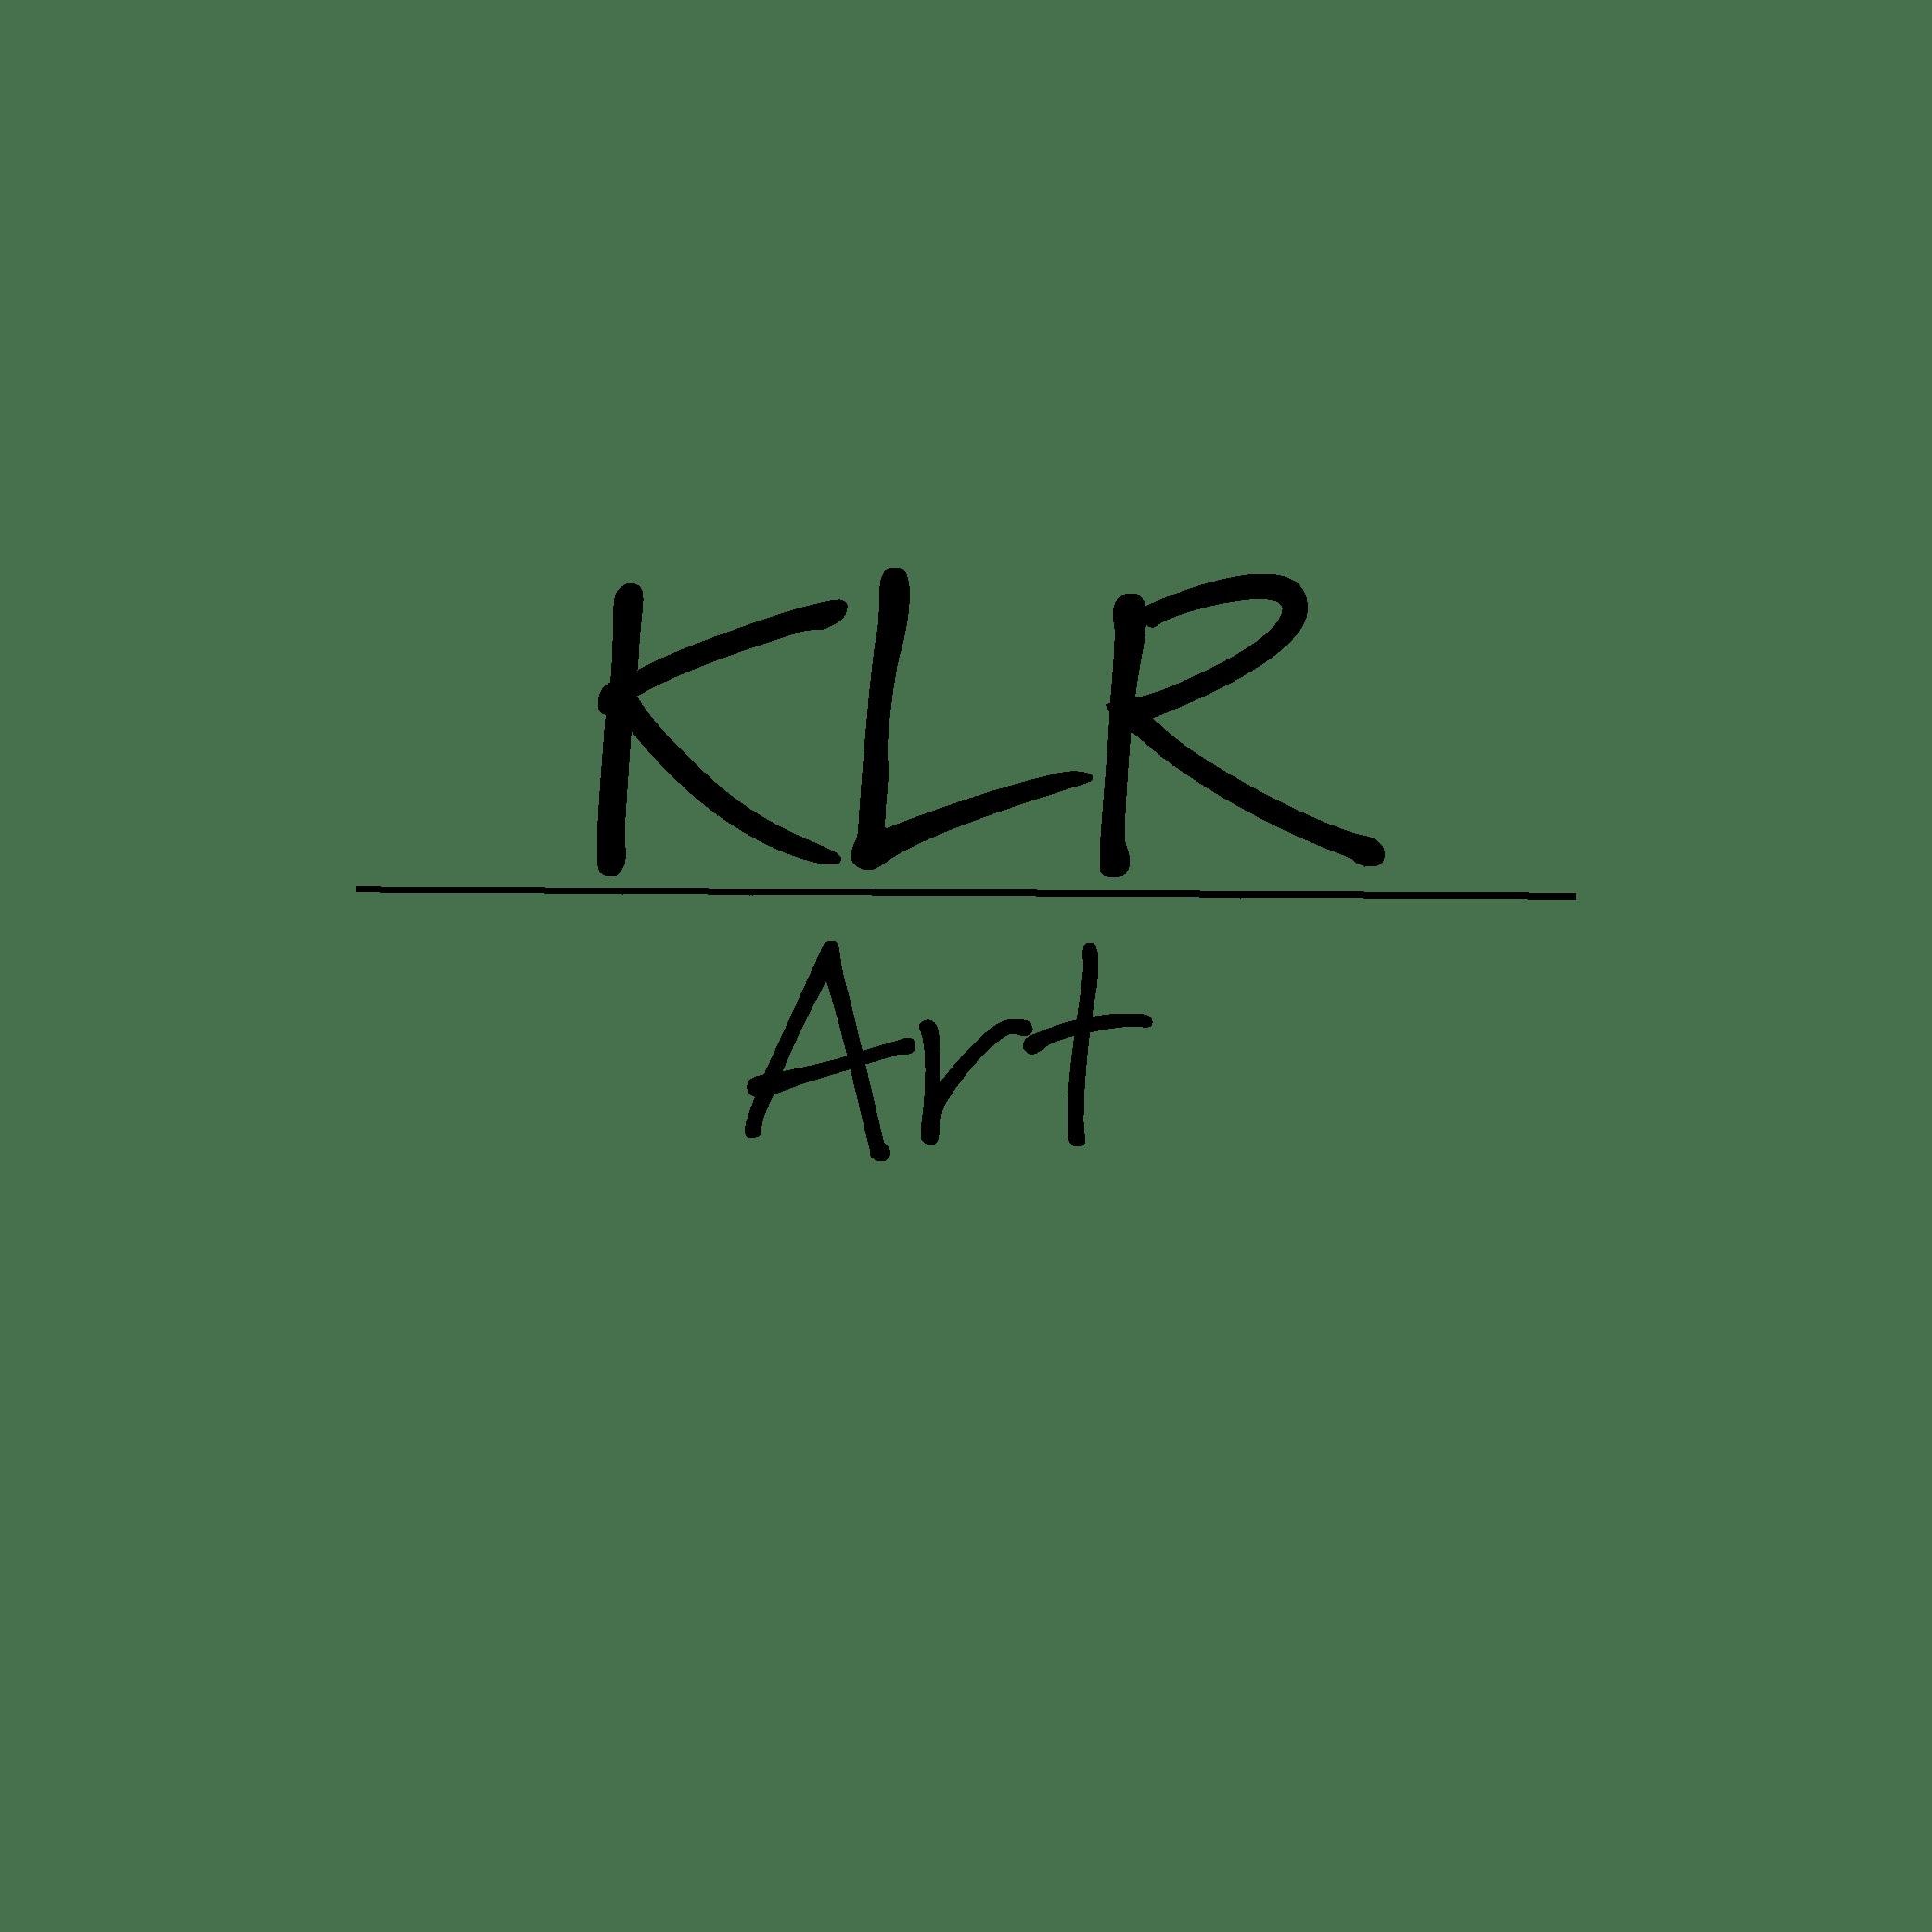 KLR ART